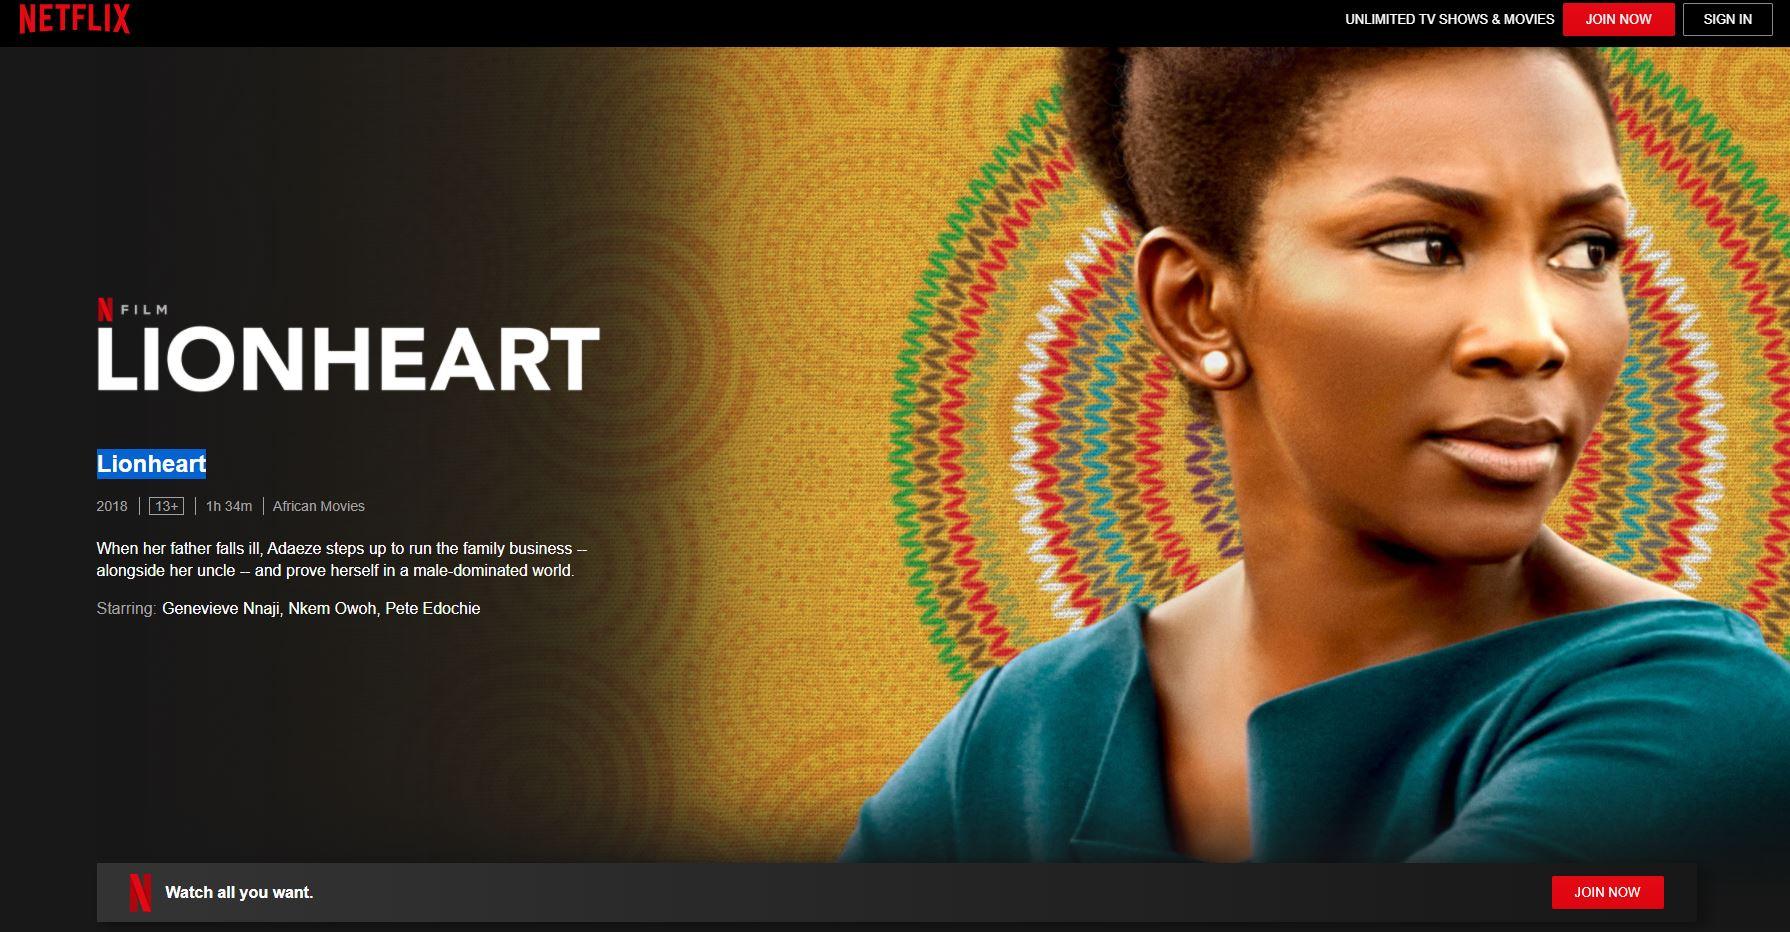 Top 10 Interesting Nollywood Movies on Netflix (2020)